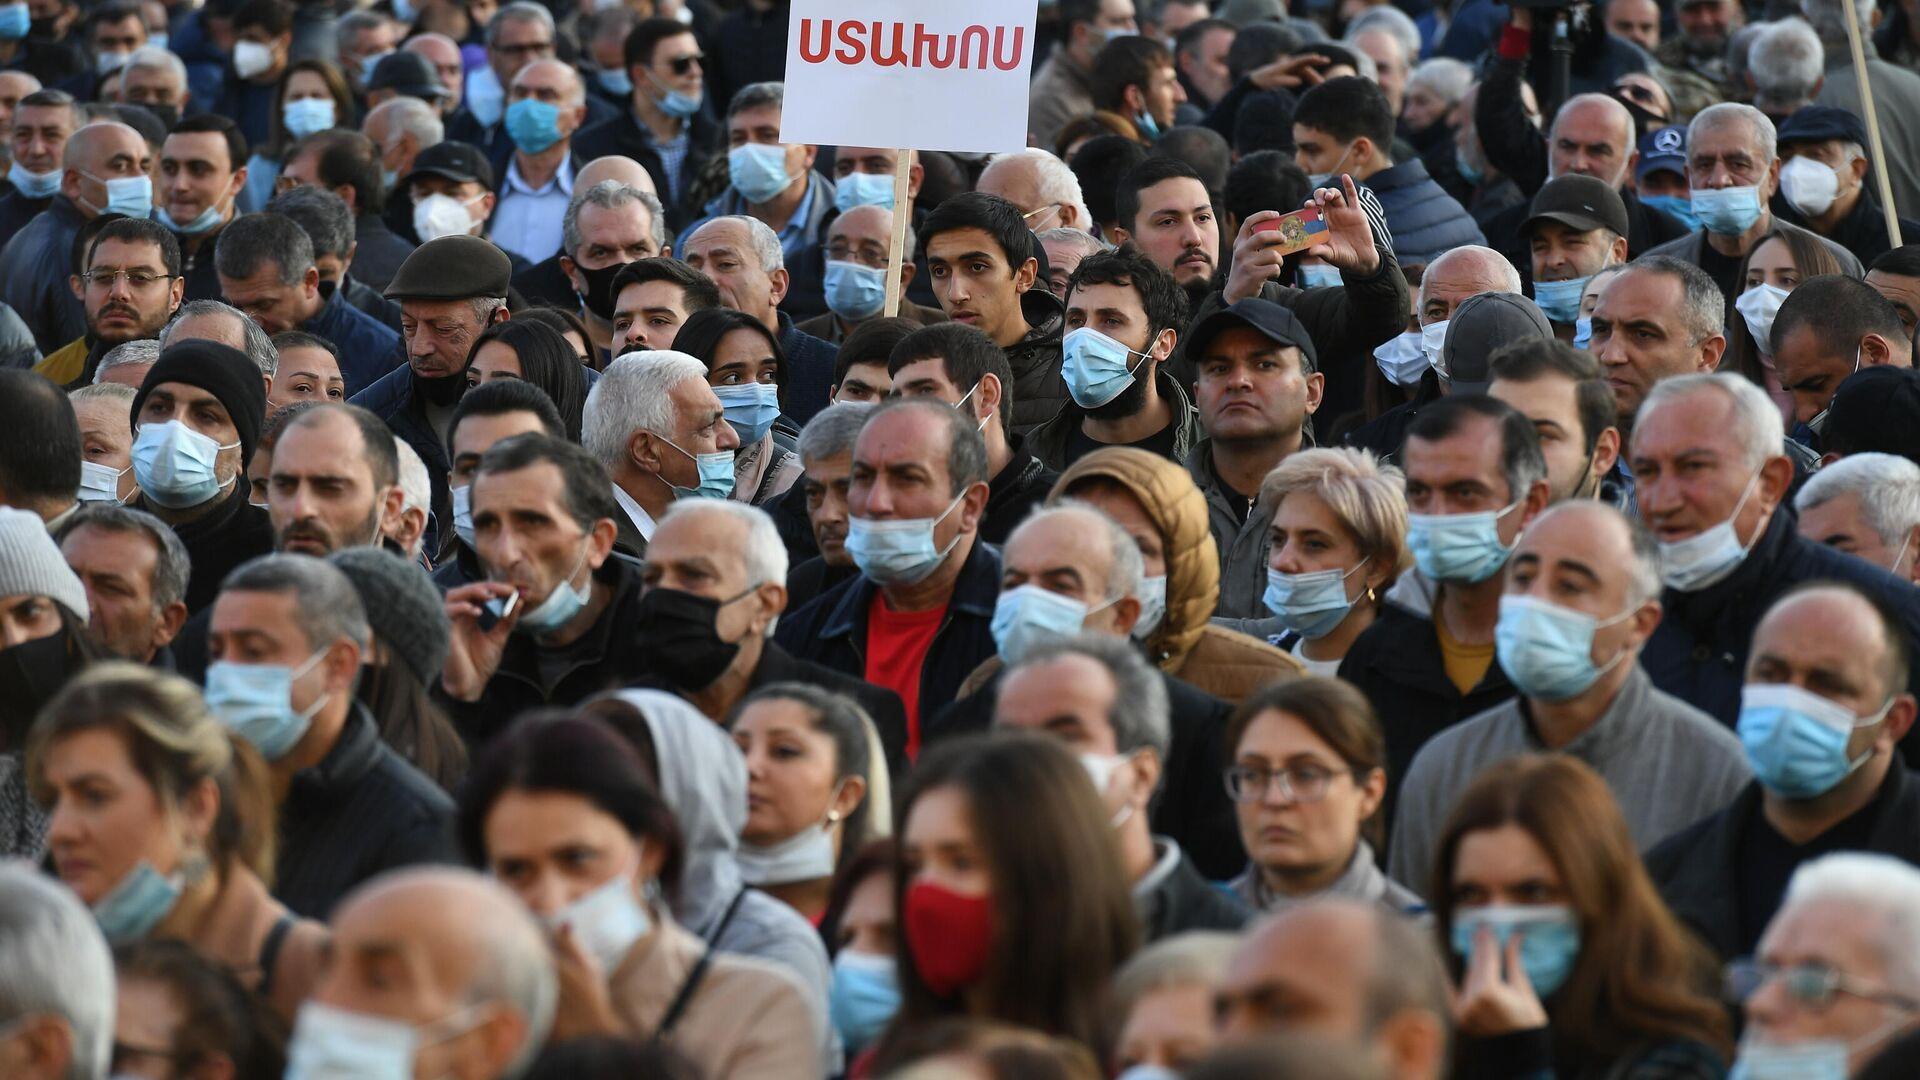 Участники митинга оппозиции в Ереване - РИА Новости, 1920, 14.11.2020